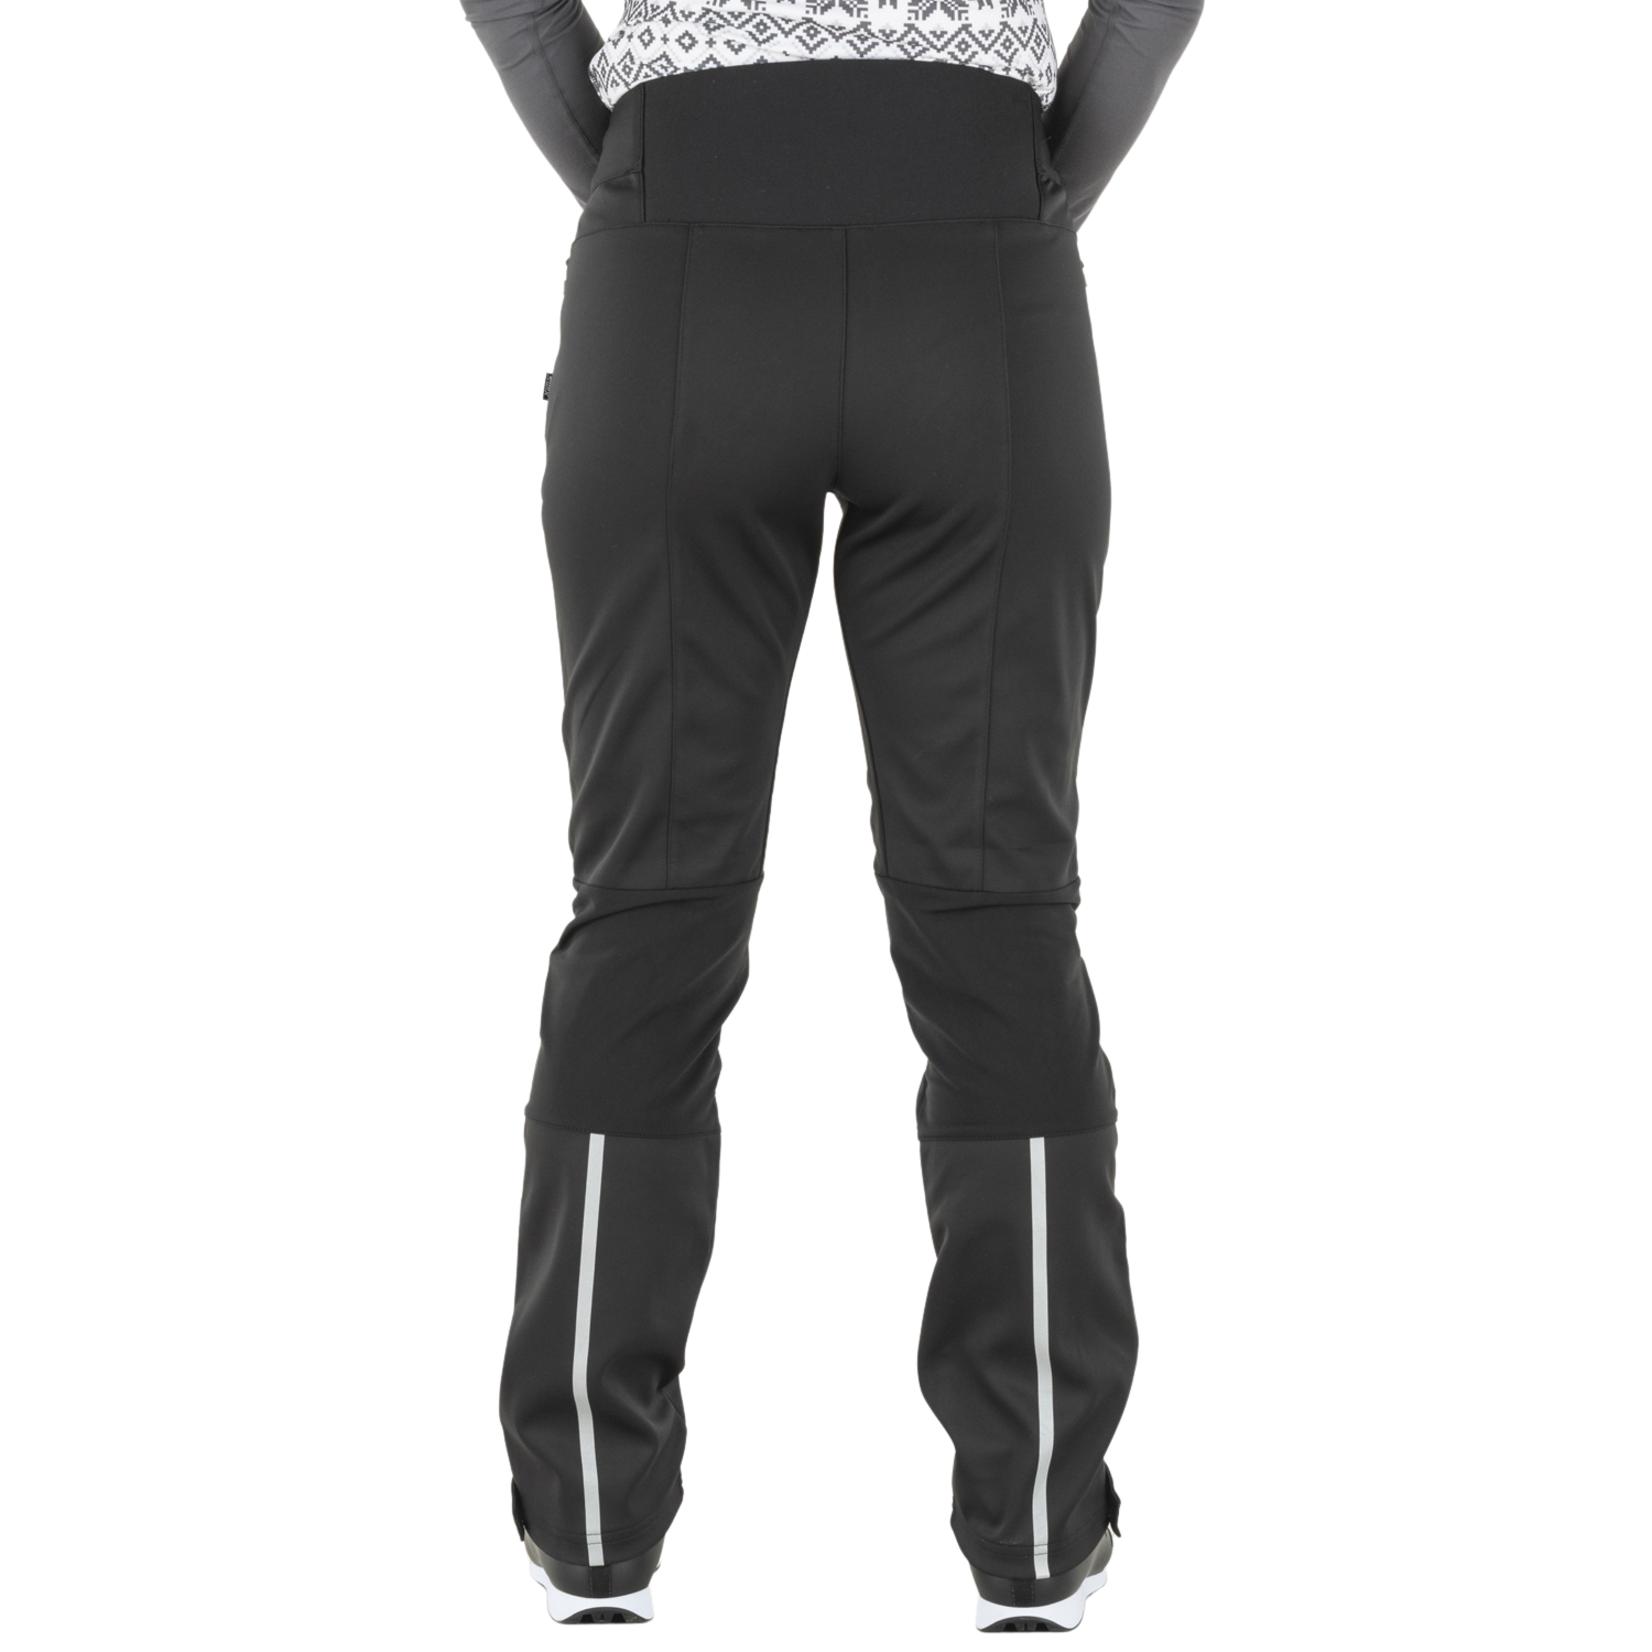 Swix Swix Voldo Light Softshell Pants Women's